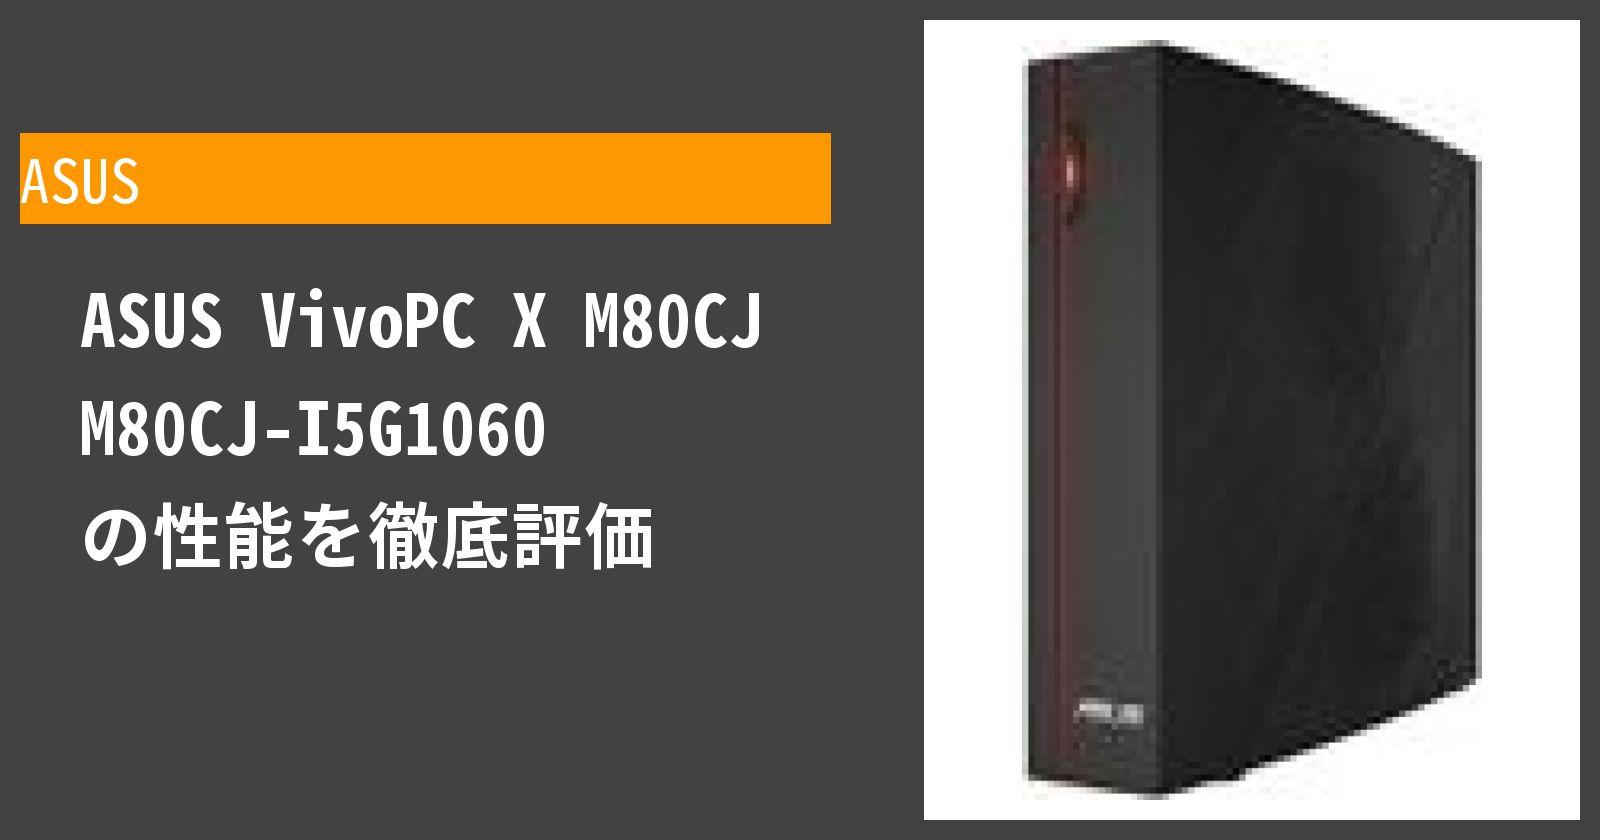 VivoPC X M80CJ(M80CJ-I5G1060) の性能を徹底評価